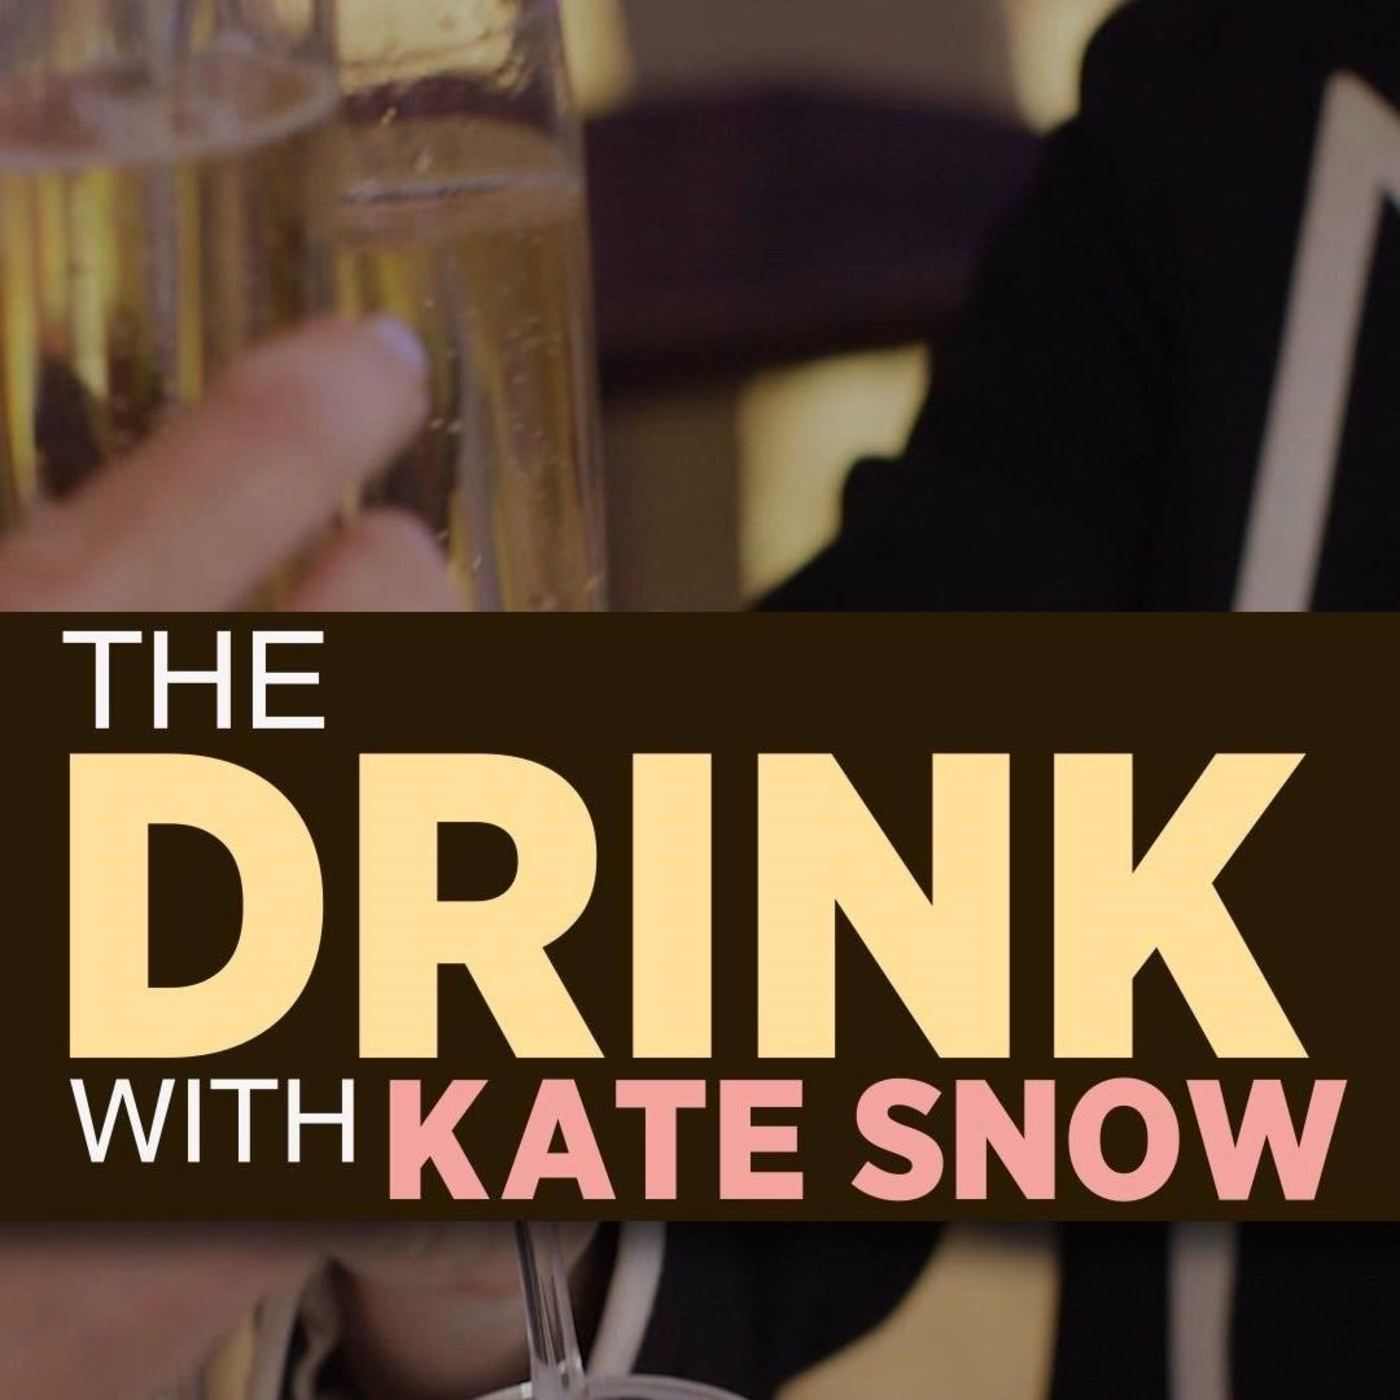 The Drink with Kate Snow: Zainab Salbi